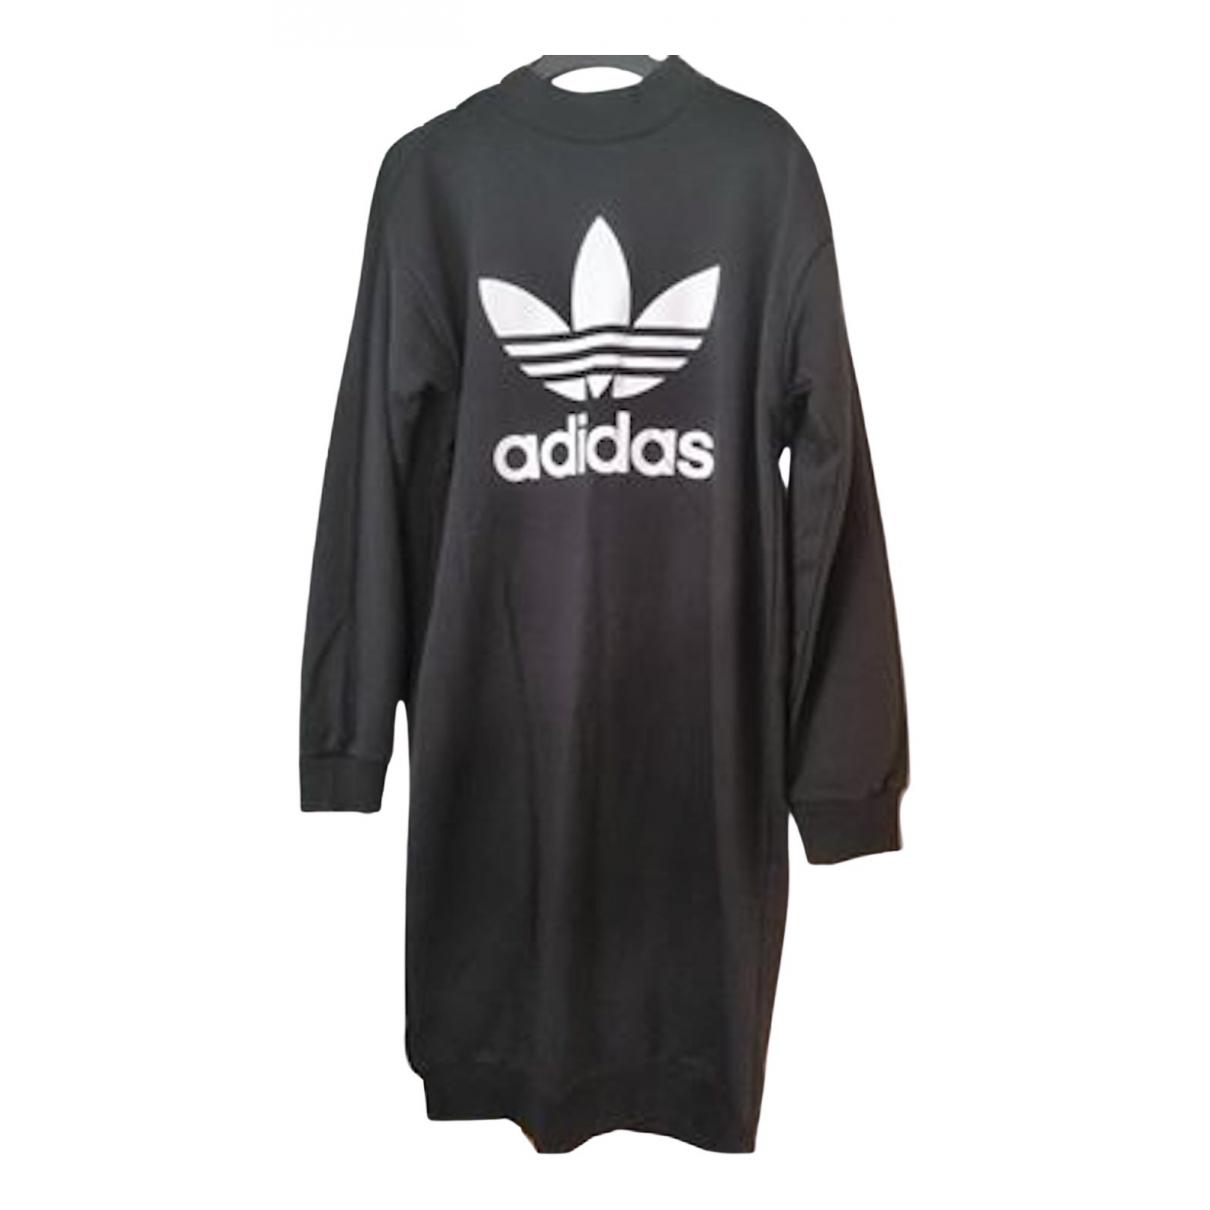 Adidas \N Kleid in  Schwarz Baumwolle